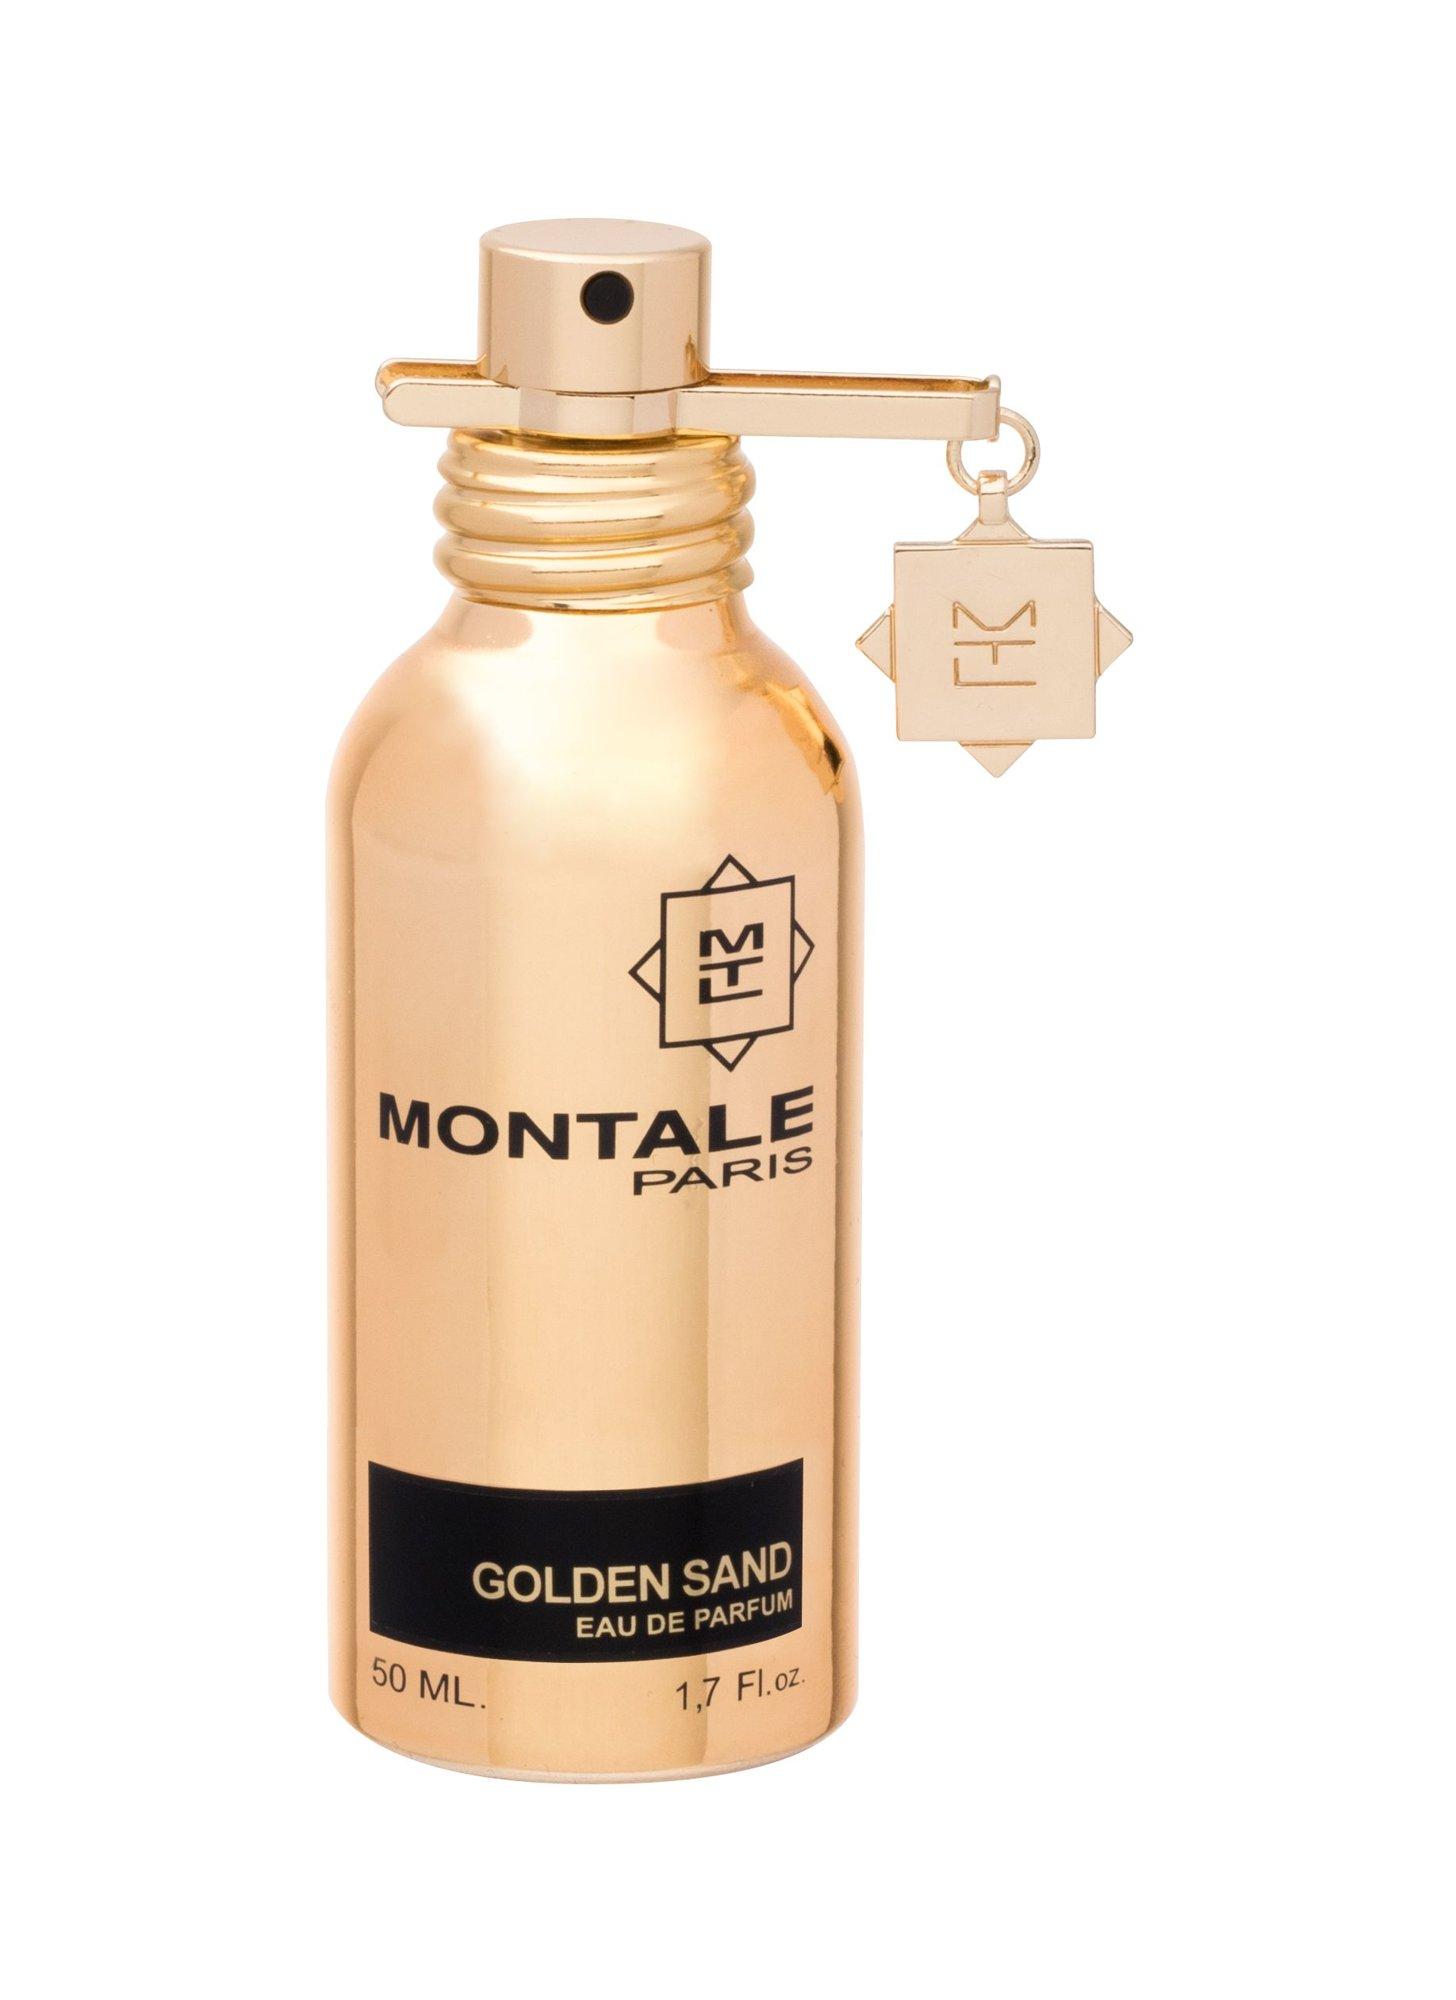 Montale Paris Golden Sand EDP 50ml